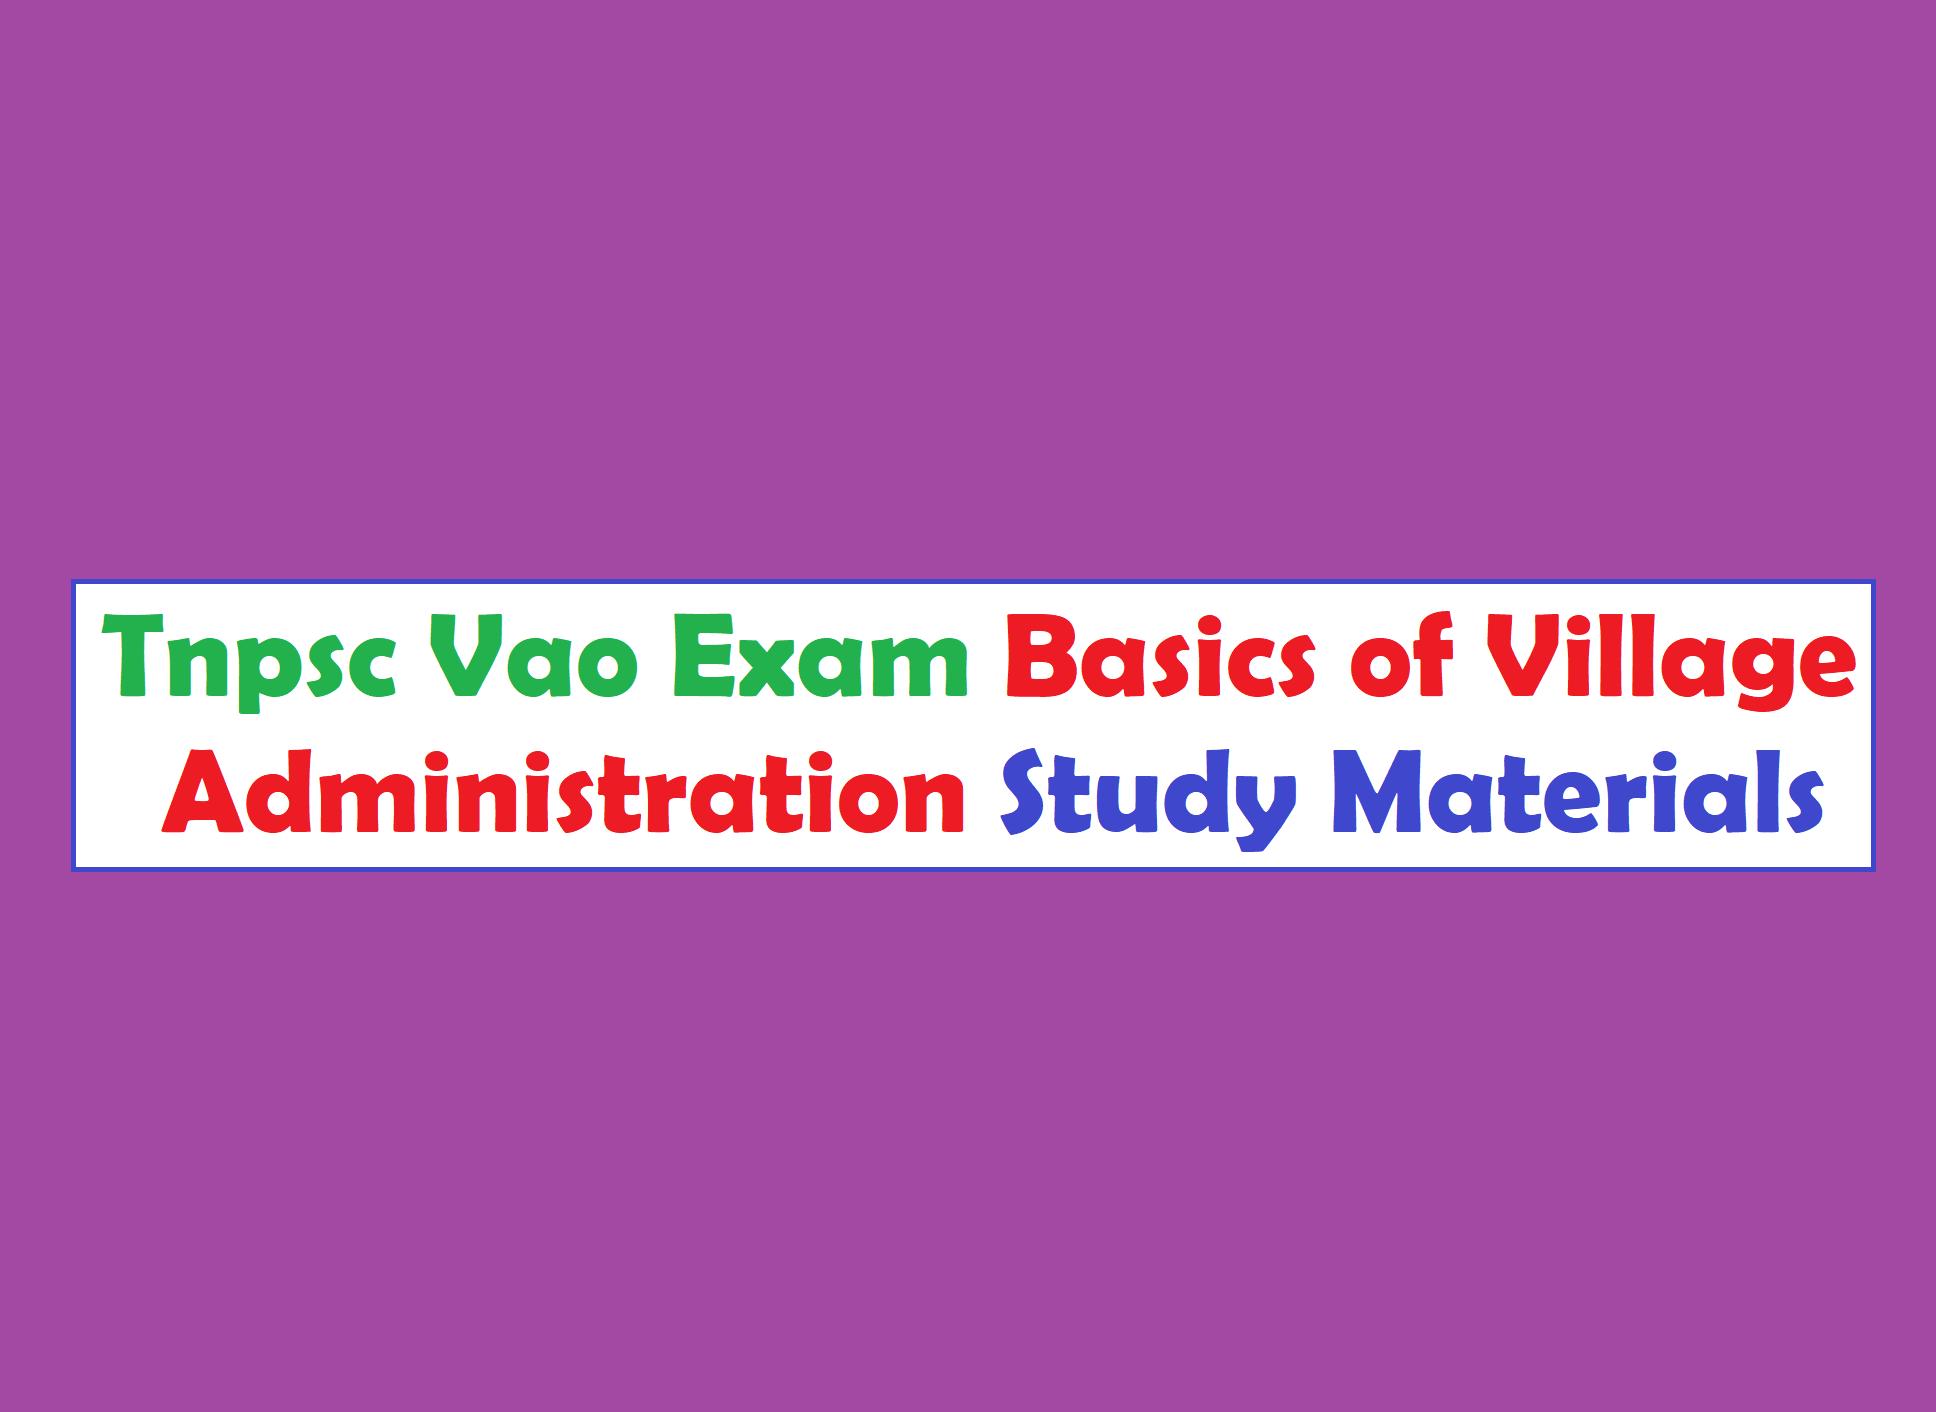 tnpsc vao exam basics of village administration study materials pdf rh winmeen com